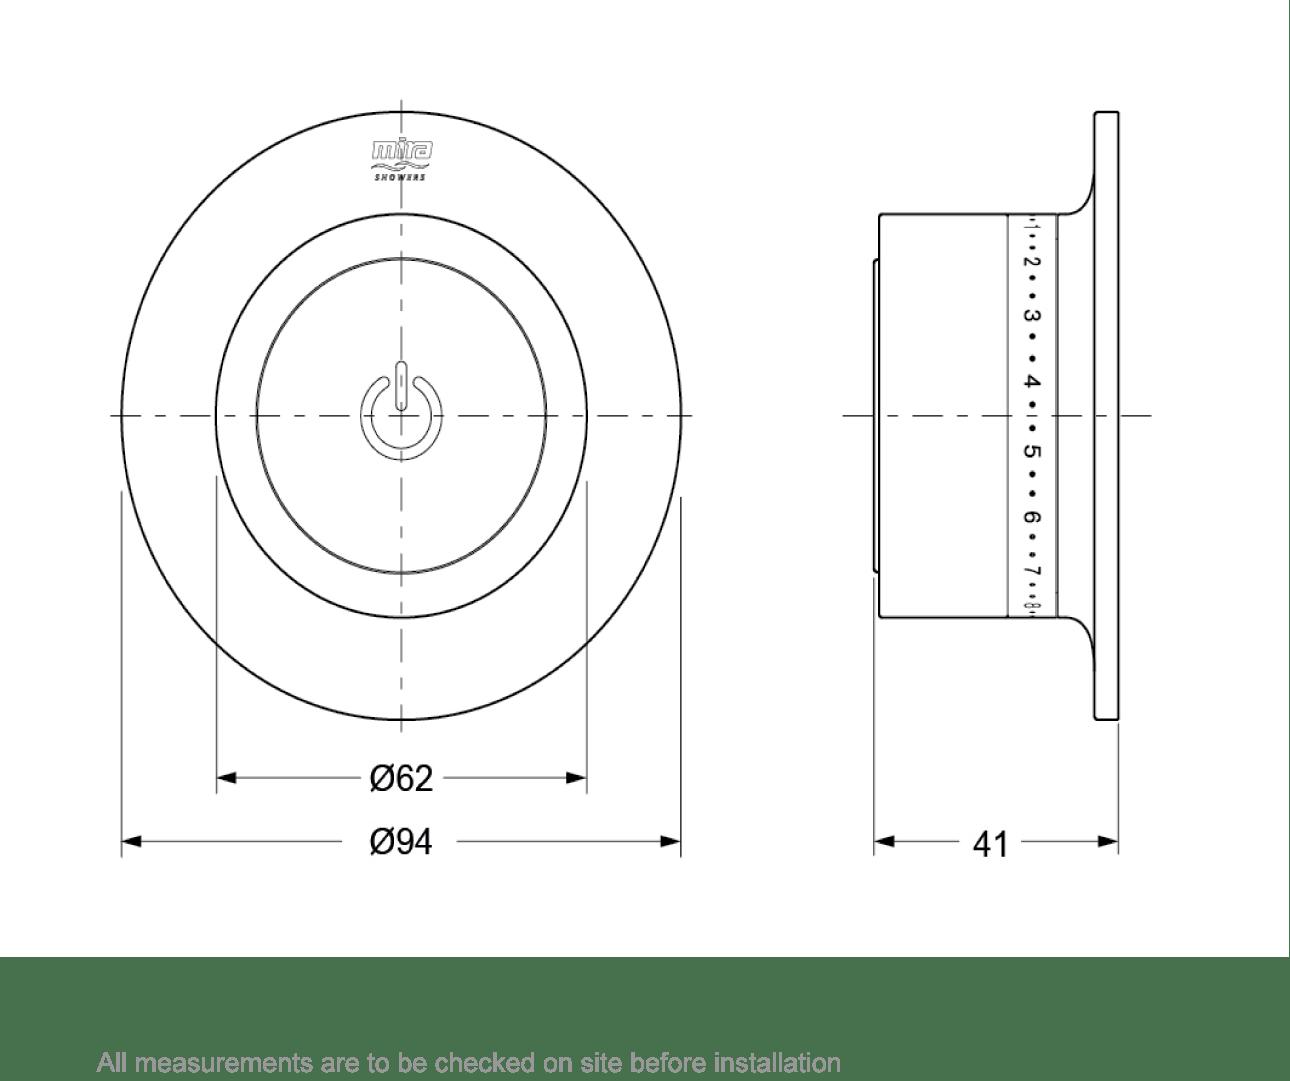 Dimensions for Mira Mode digital bath filler standard